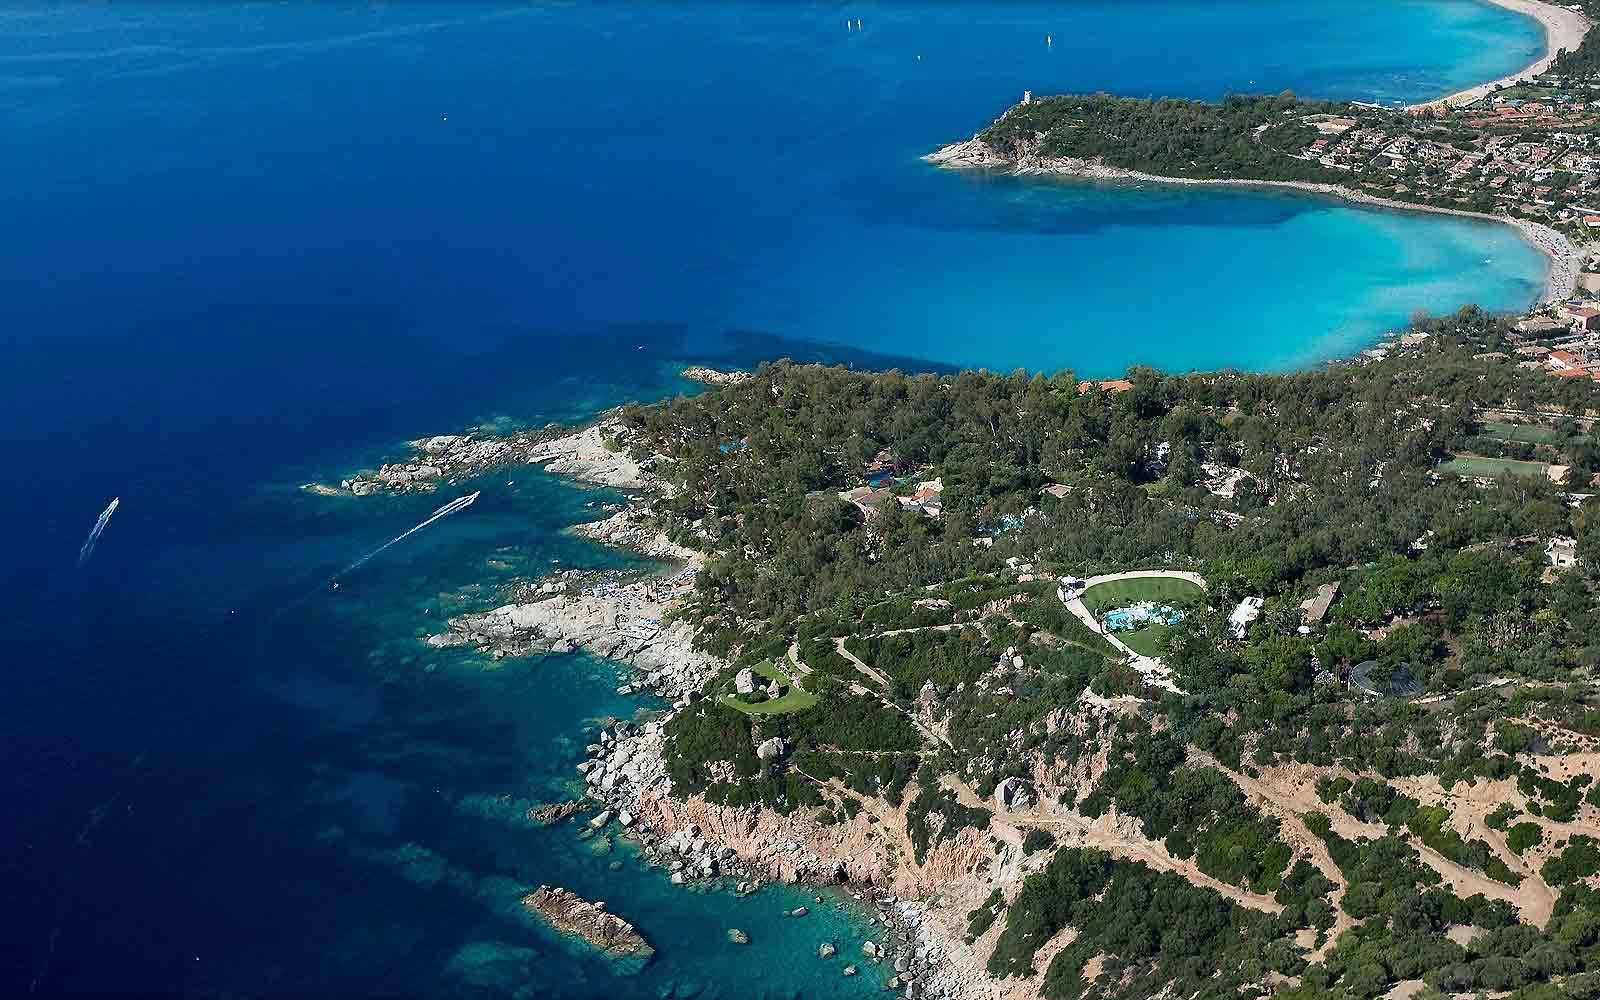 Aerial view of Arbatax Park Resort